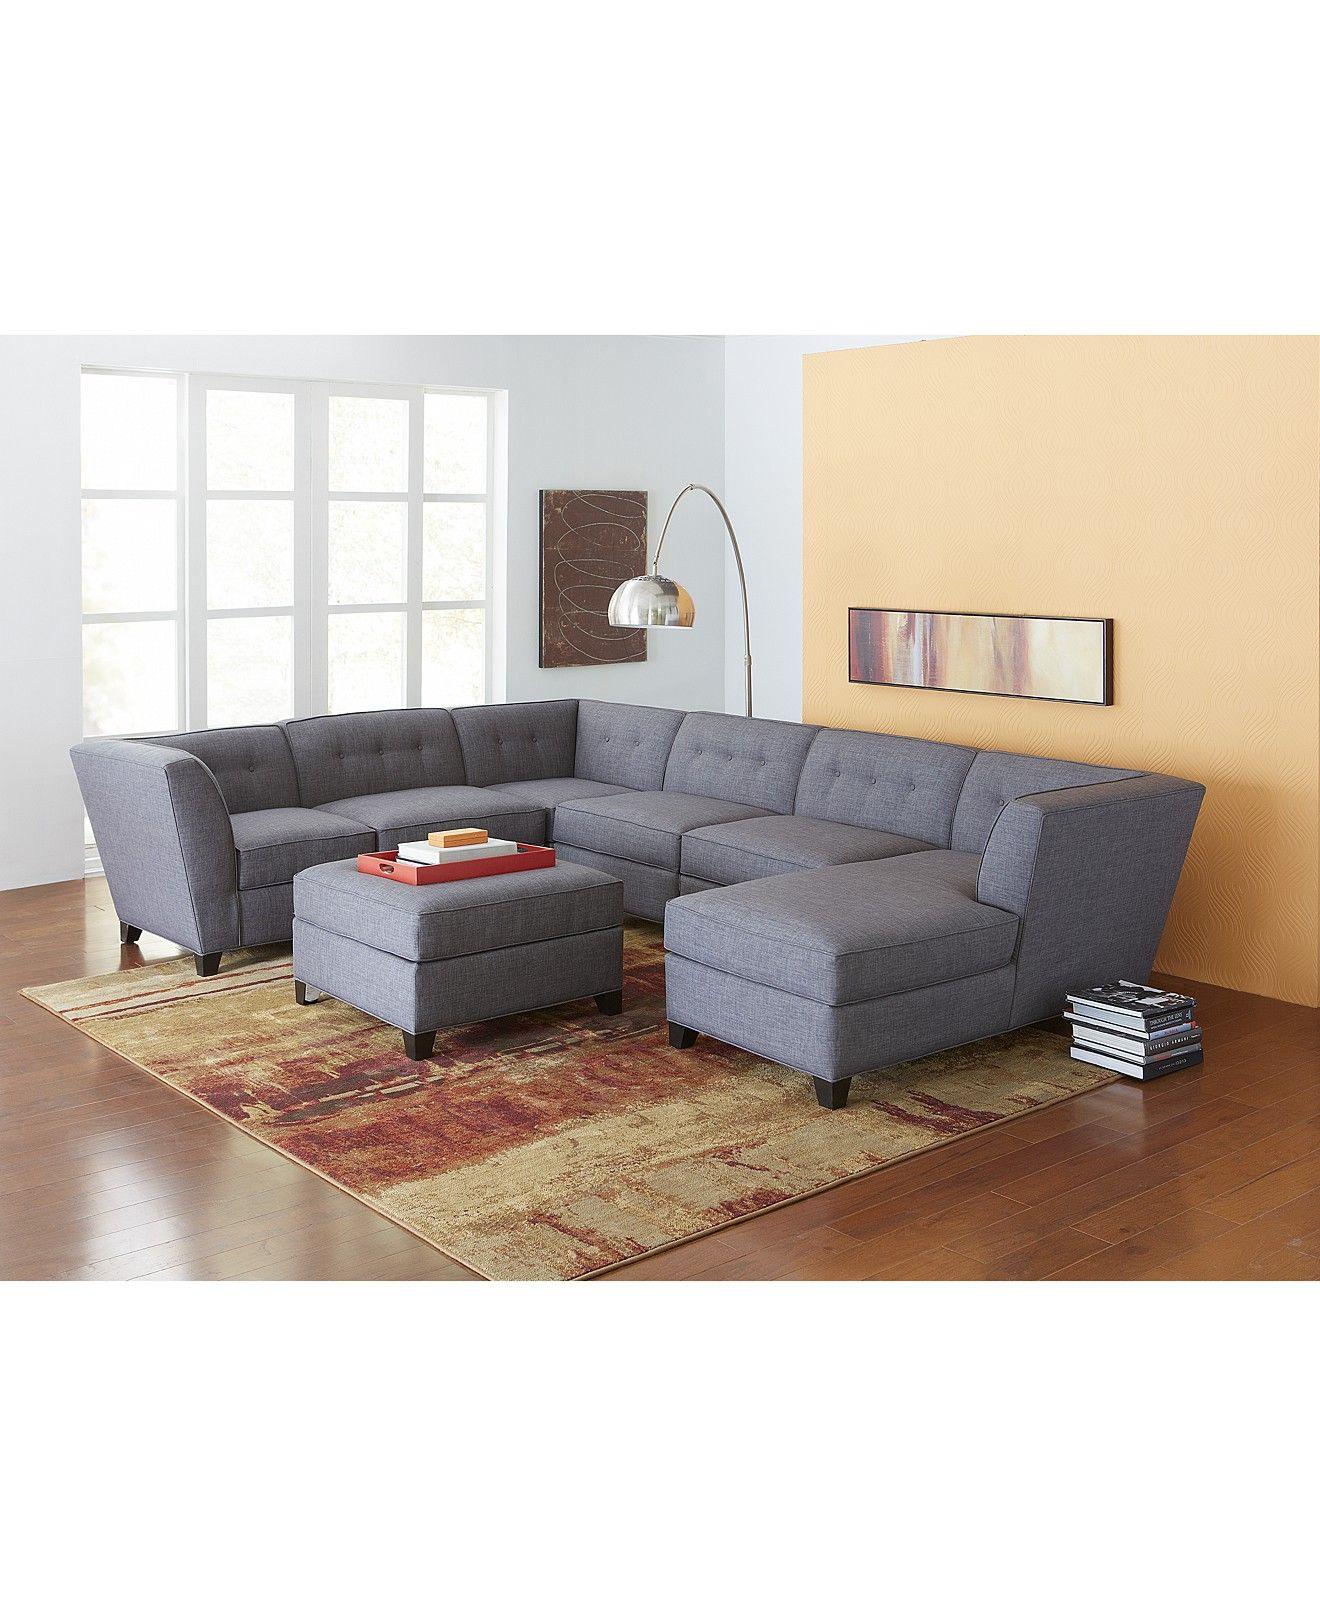 harper fabric 6 piece chaise modular sectional sofa 2 square corner rh pinterest com